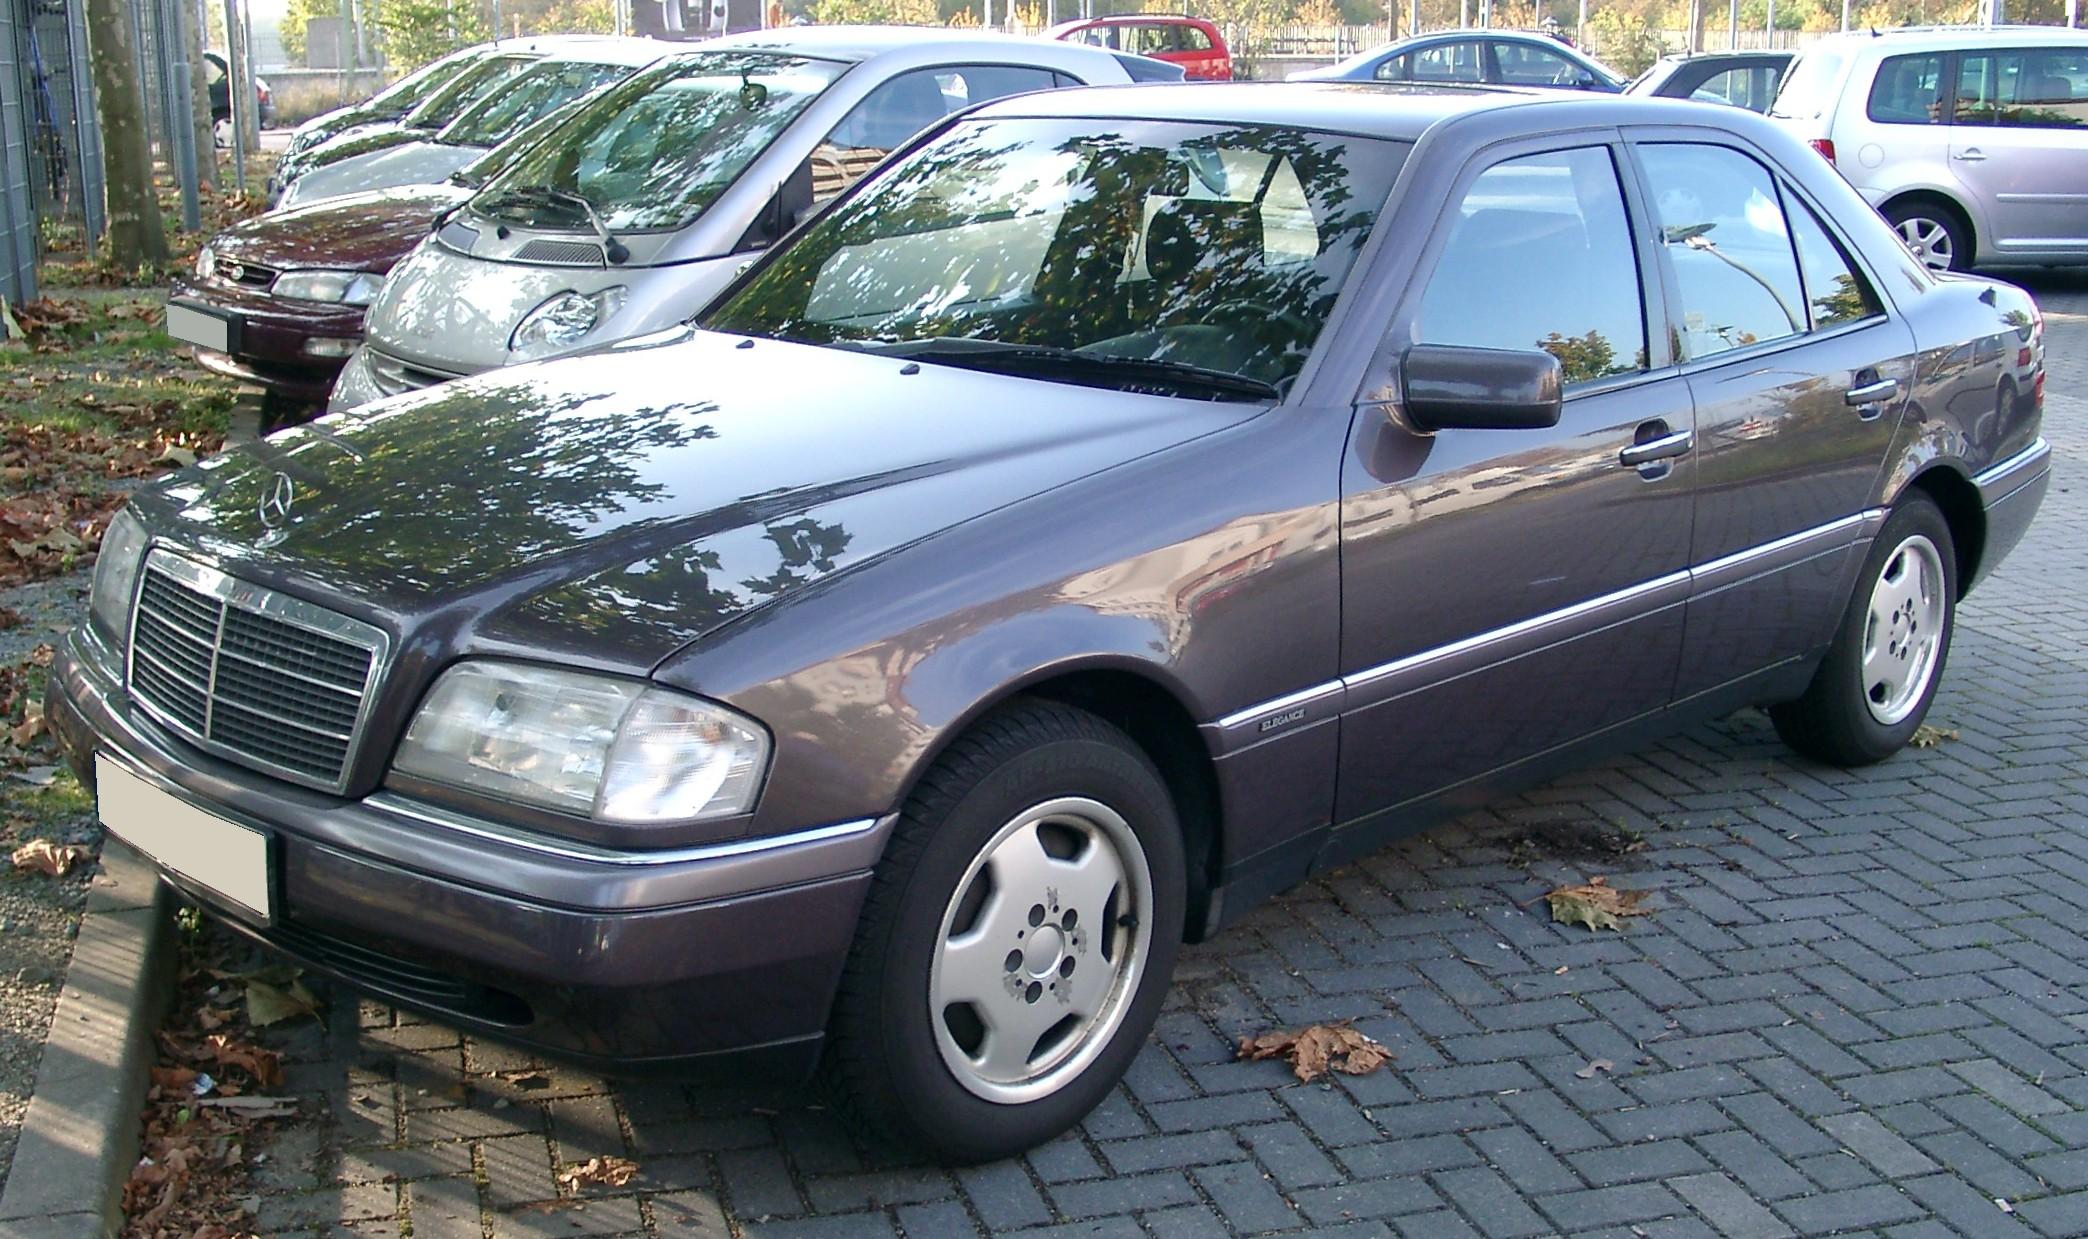 File:Mercedes W202 front 20071022.jpg - Wikimedia Commons